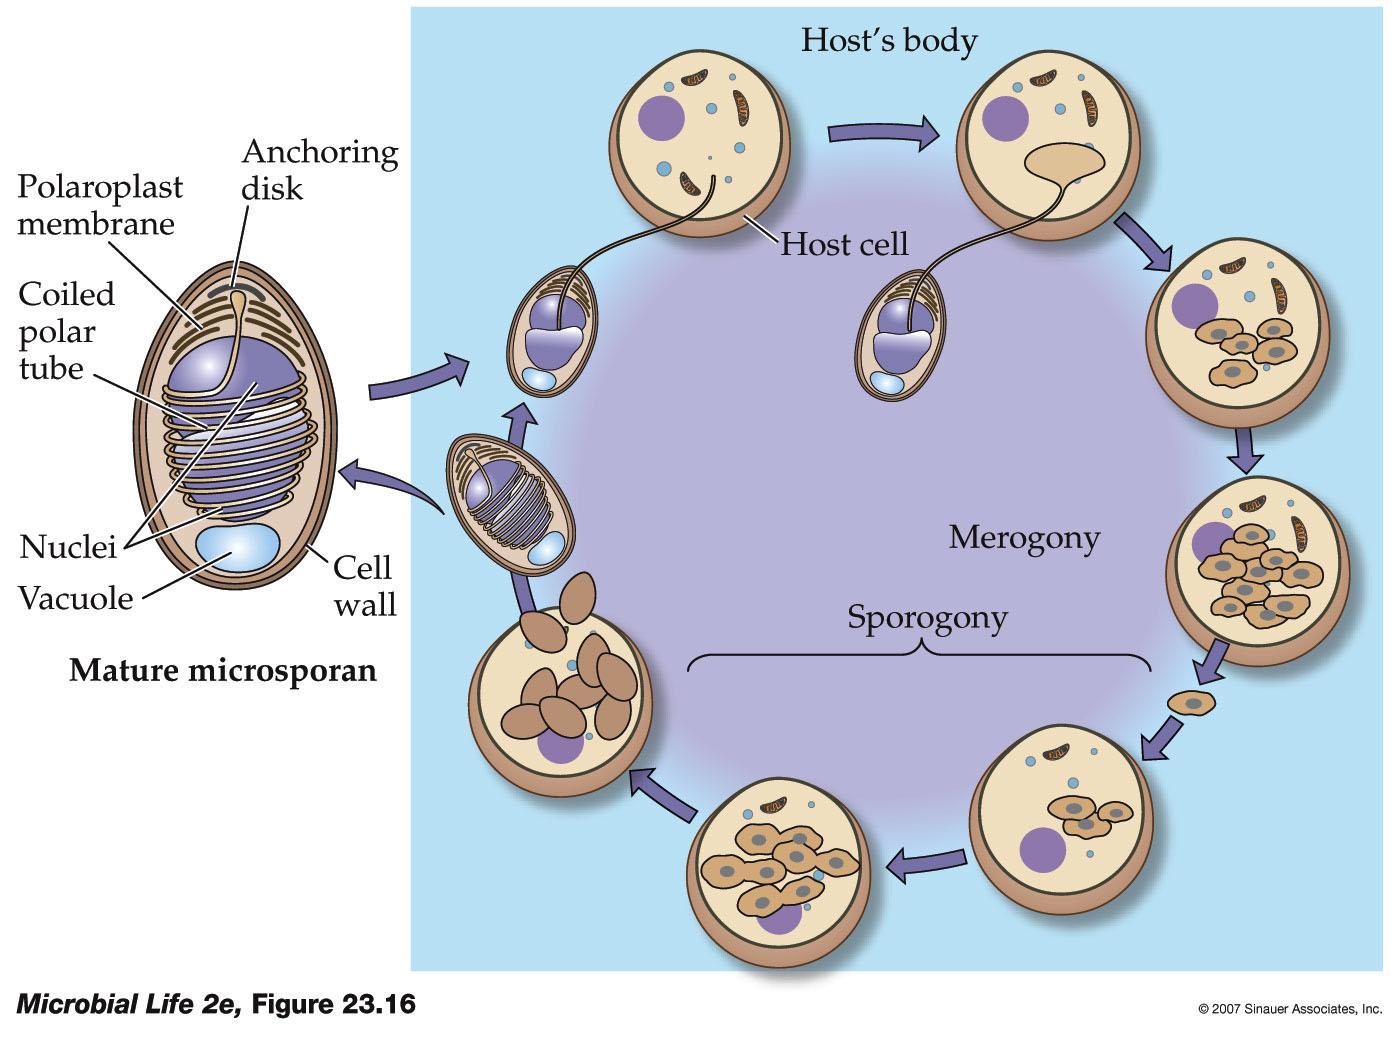 2e Cycle >> Microbial Life, 2e